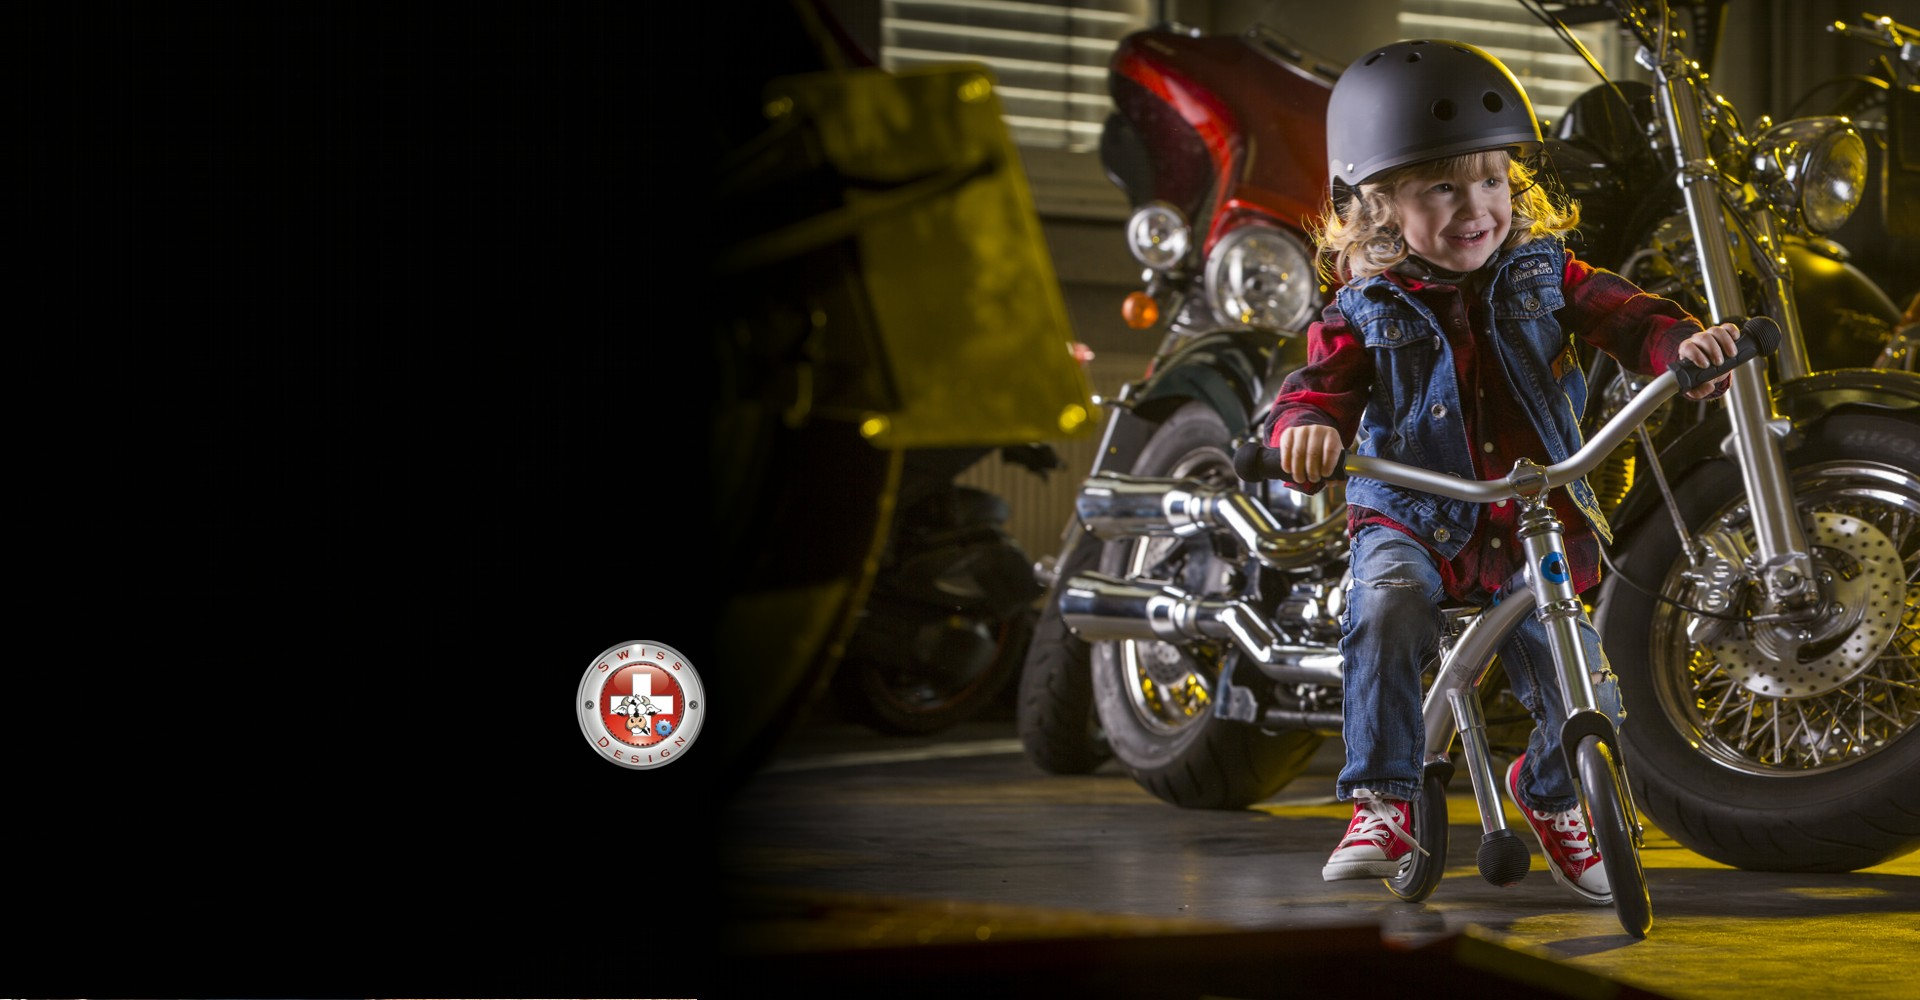 G-bike CHOPPER